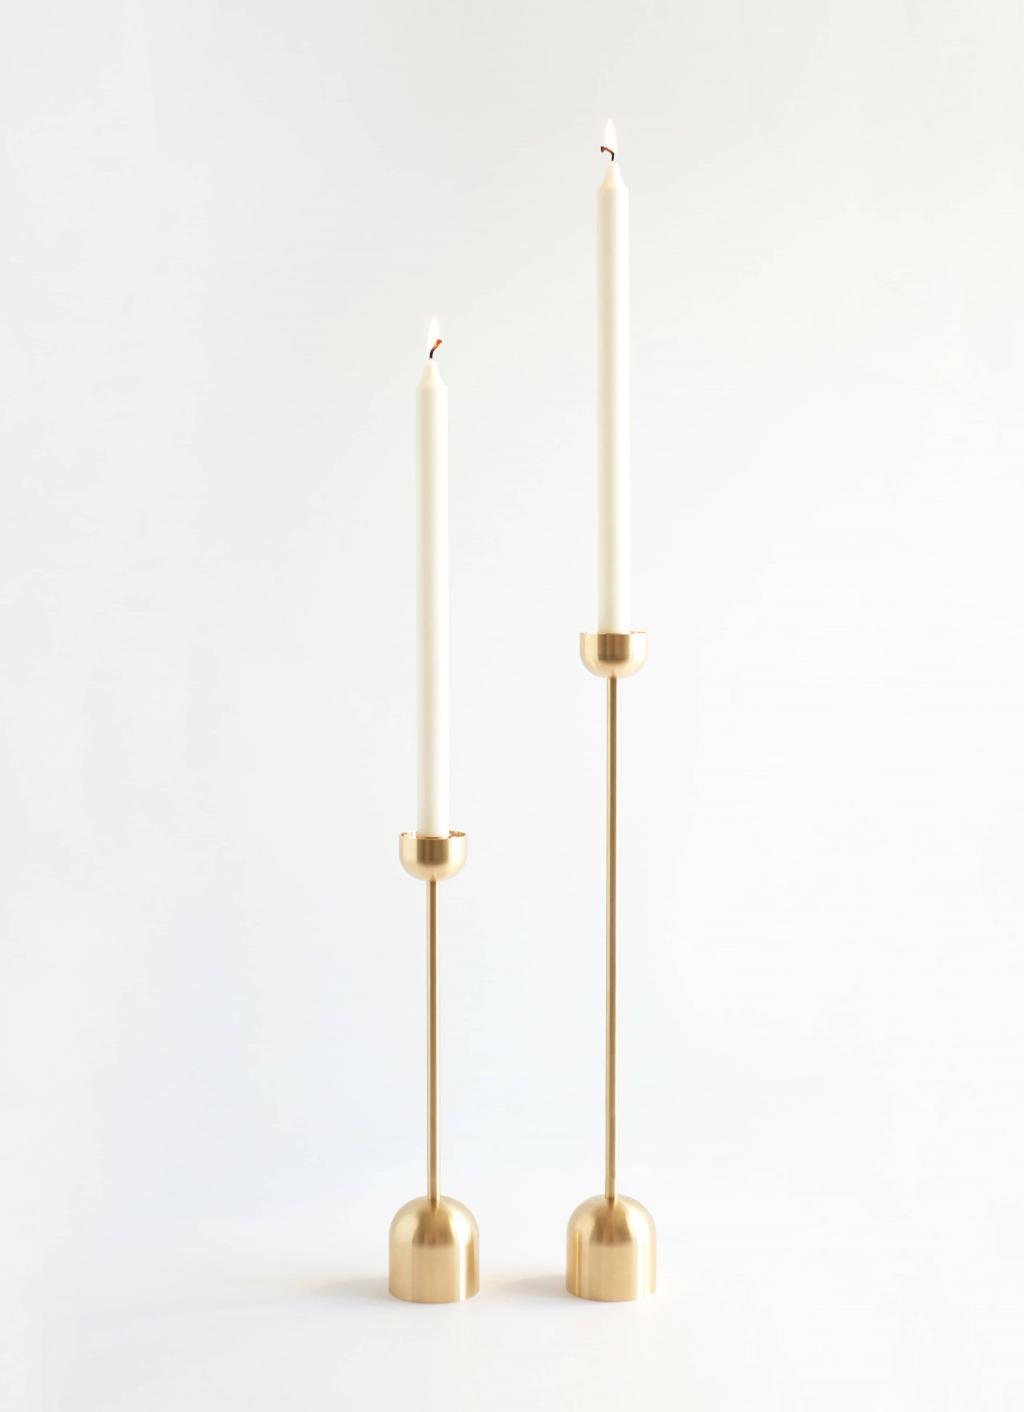 Fort Standard - Dome Spindle Candle Holder - Brass